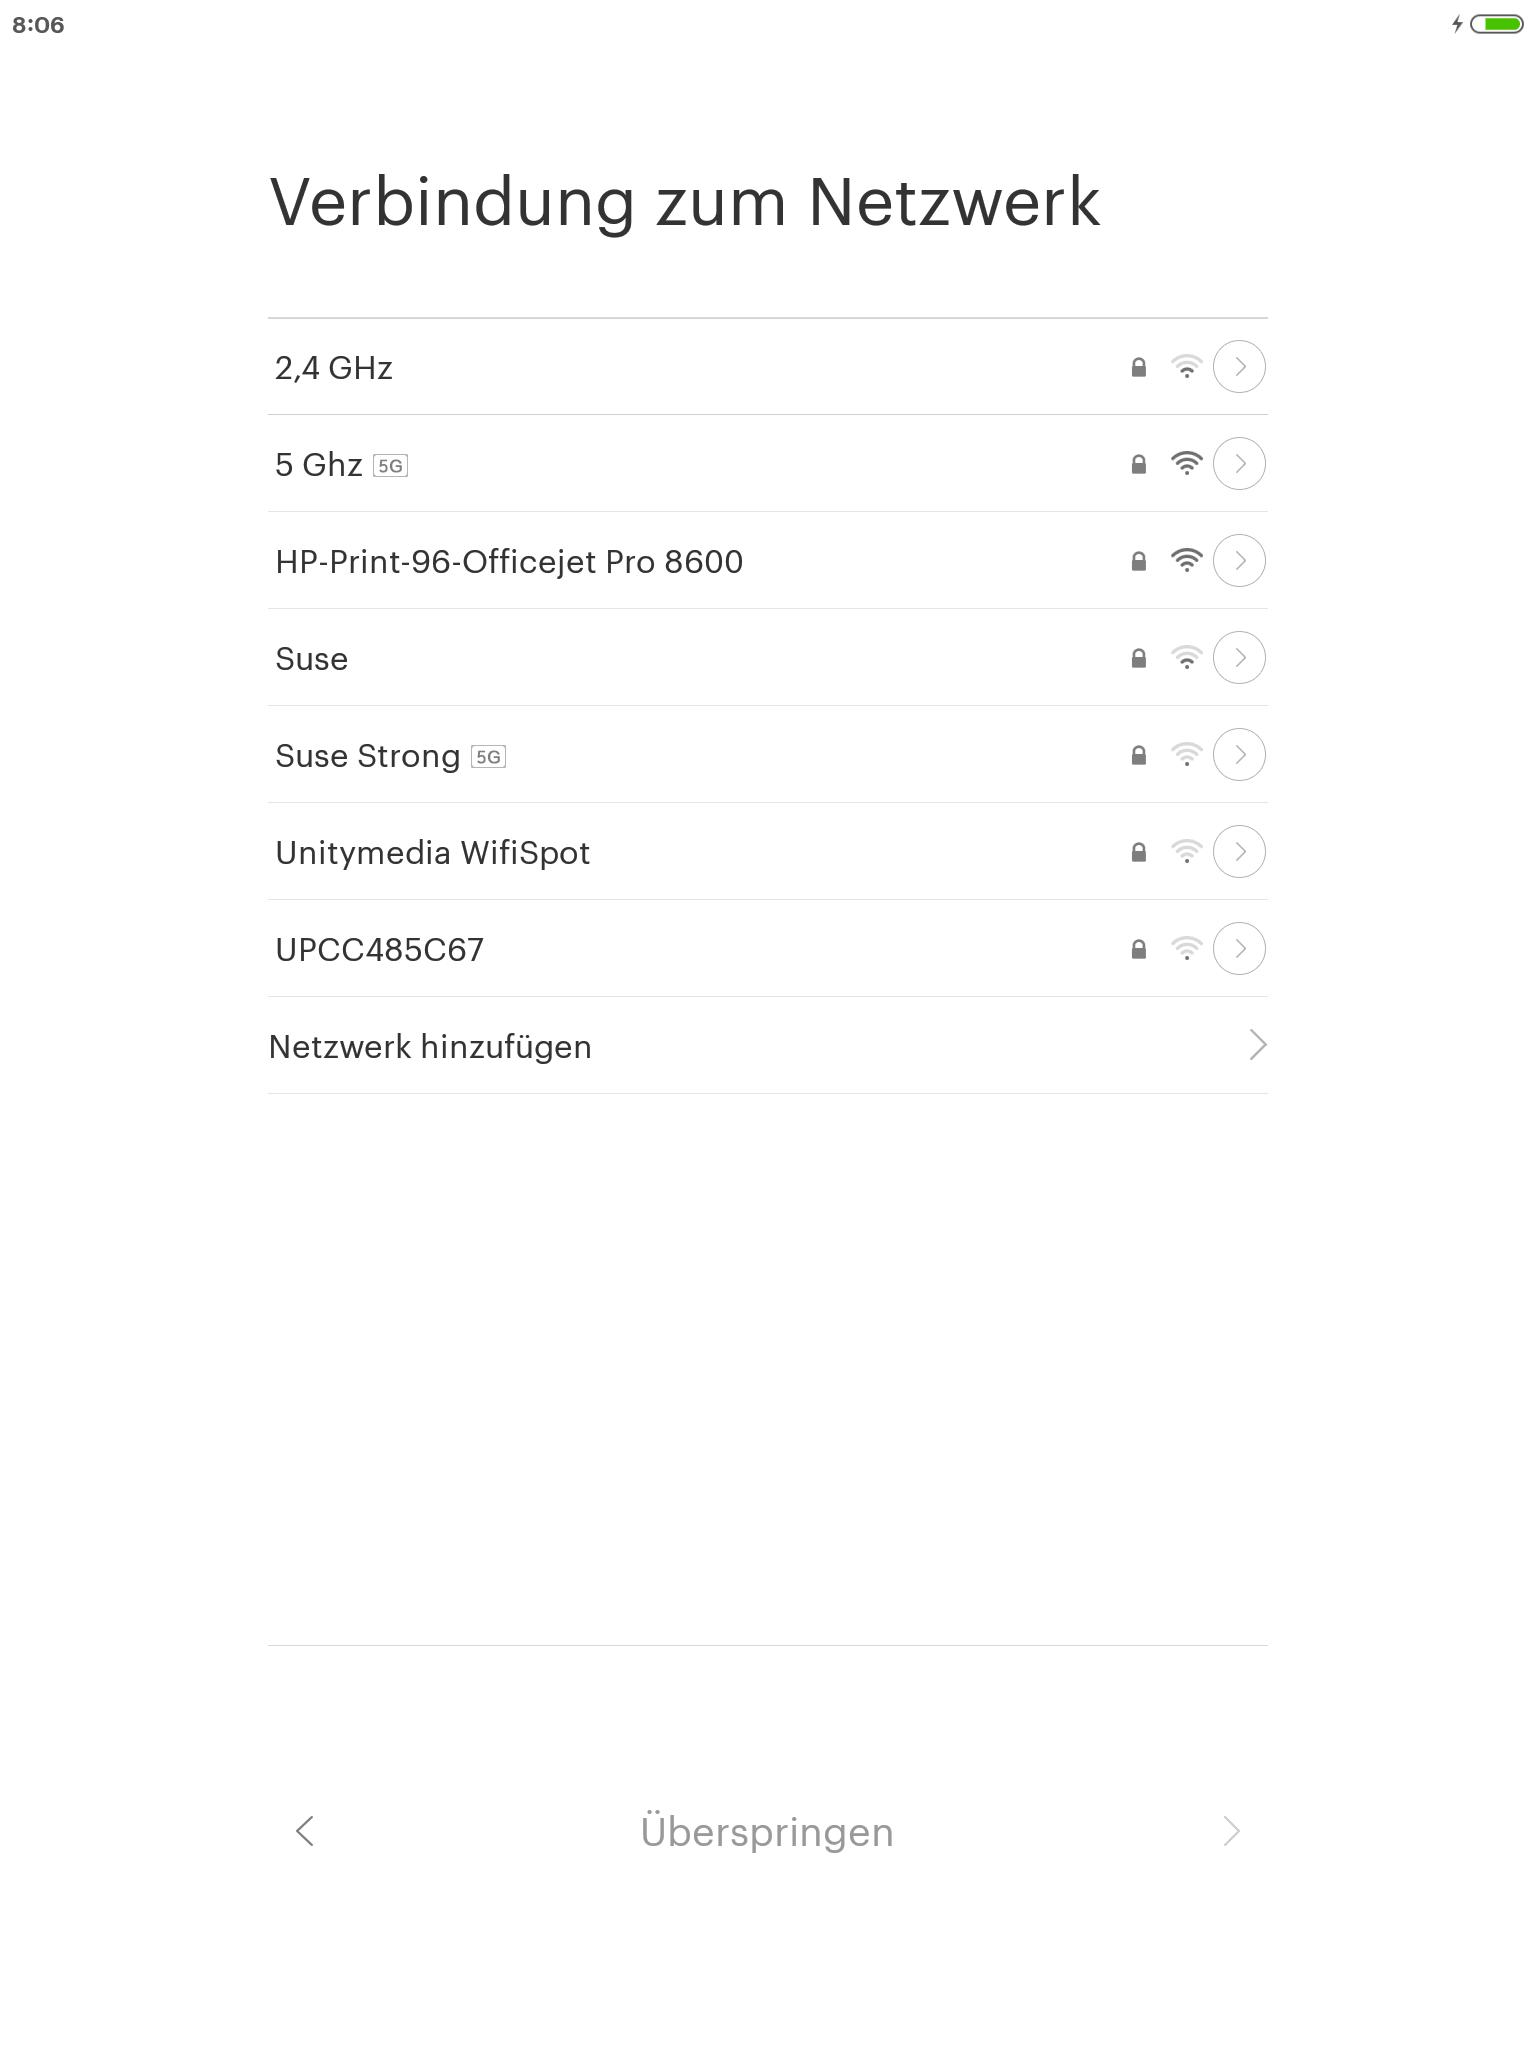 Xiaomi Mi Pad 3 Test – das ideale Tablet für Couch-Potatoes 11 techboys.de • smarte News, auf den Punkt! Xiaomi Mi Pad 3 Test – das ideale Tablet für Couch-Potatoes